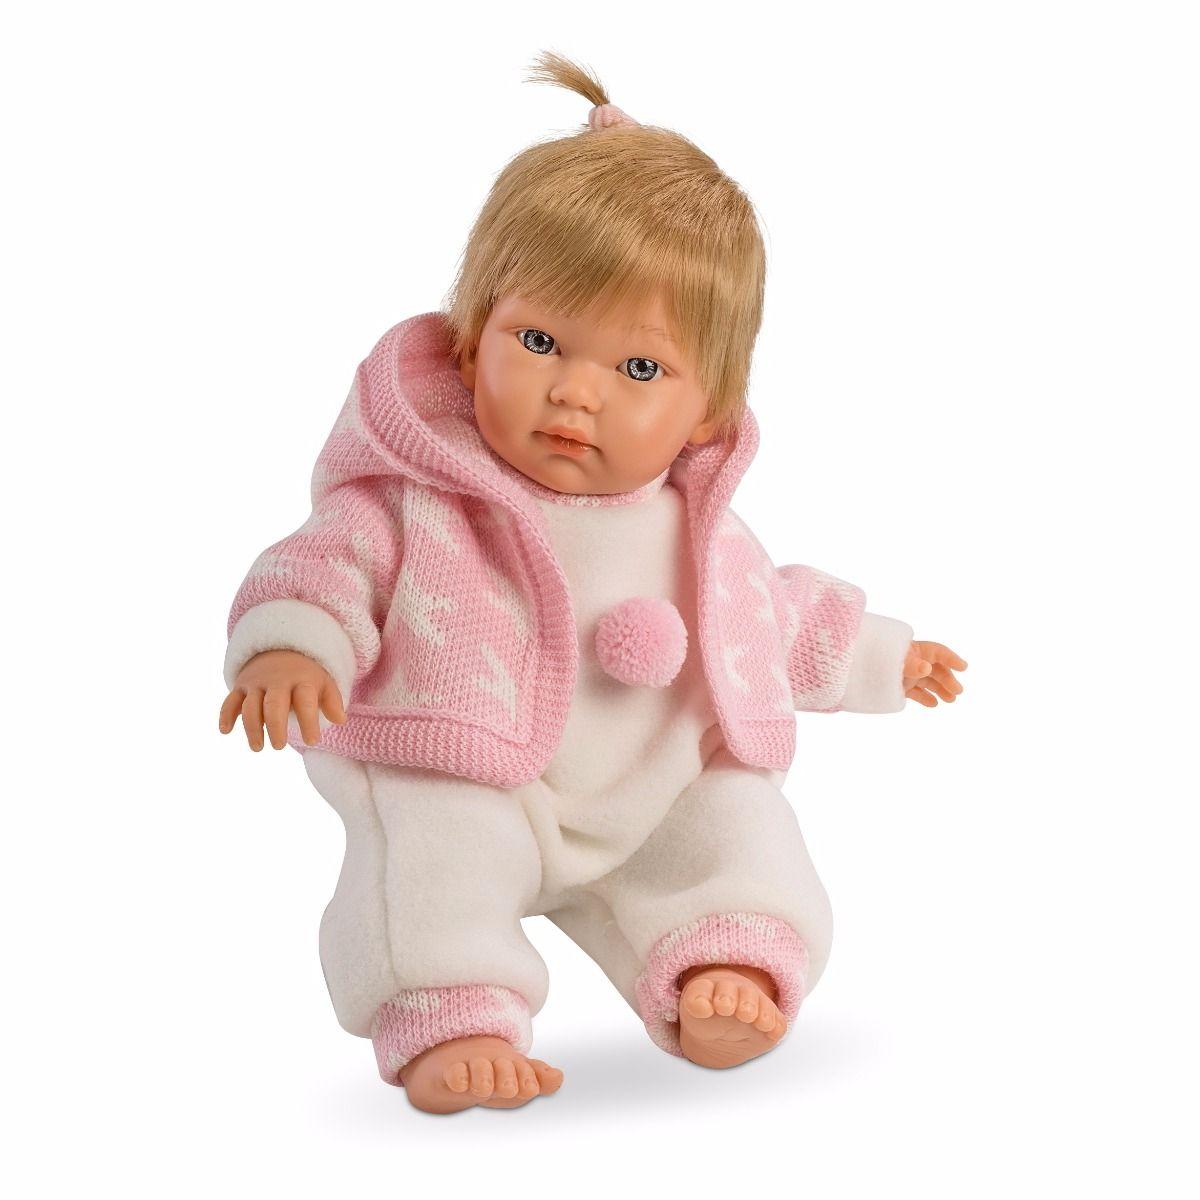 Кукла Кука, 30 смИспанские куклы Llorens Juan, S.L.<br>Кукла Кука, 30 см<br>